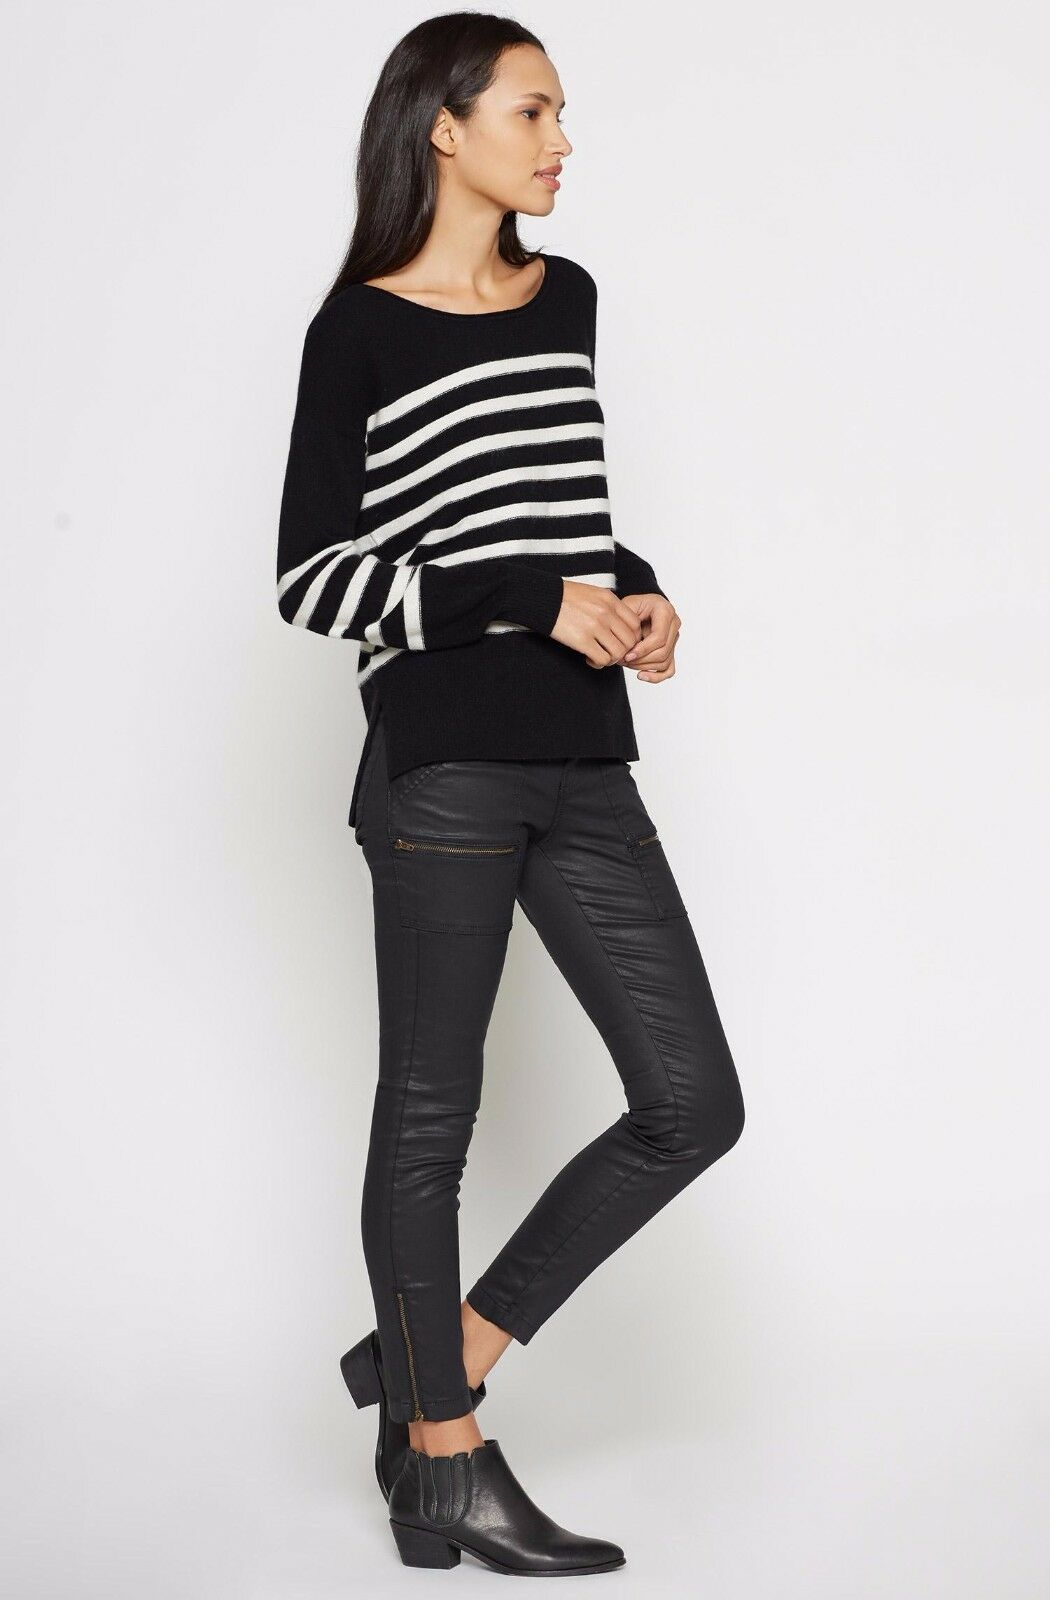 NEW Joie Simonne Stripe Wool & Cashmere Sweater- Caviar size M